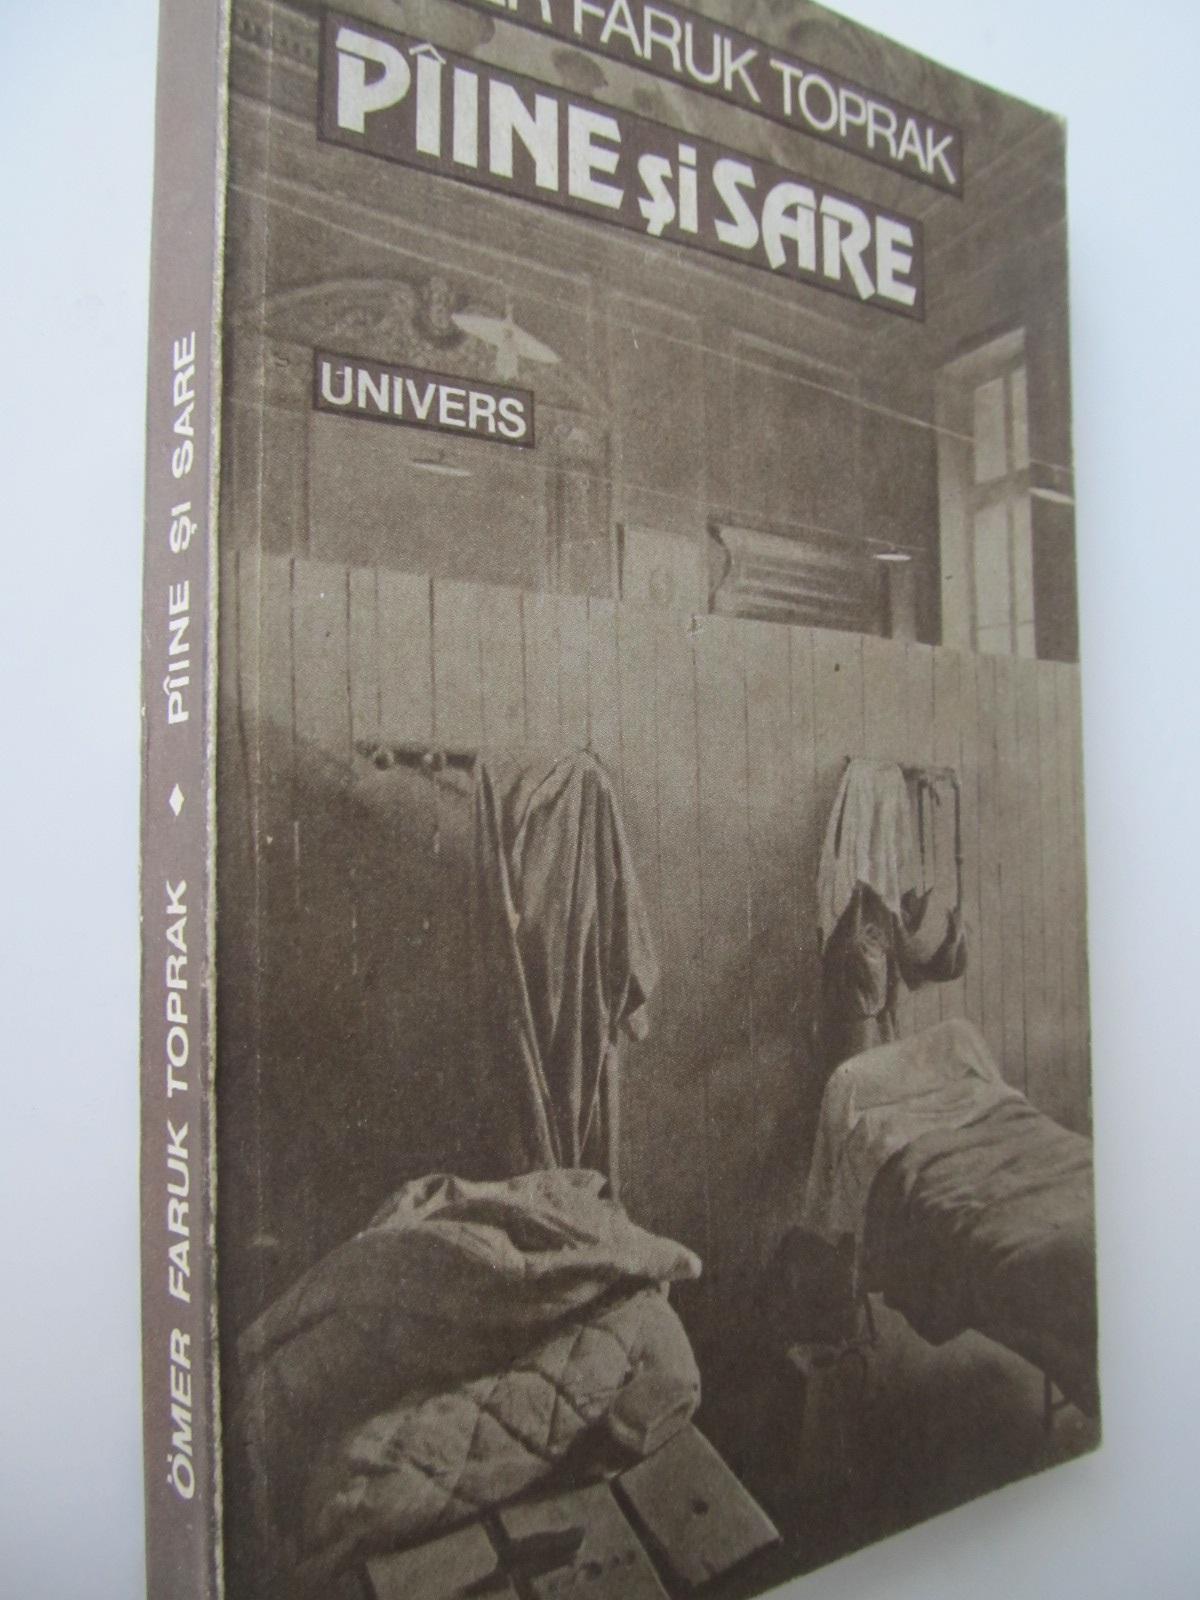 Paine si sare - Omer Faruk Toprak   Detalii carte